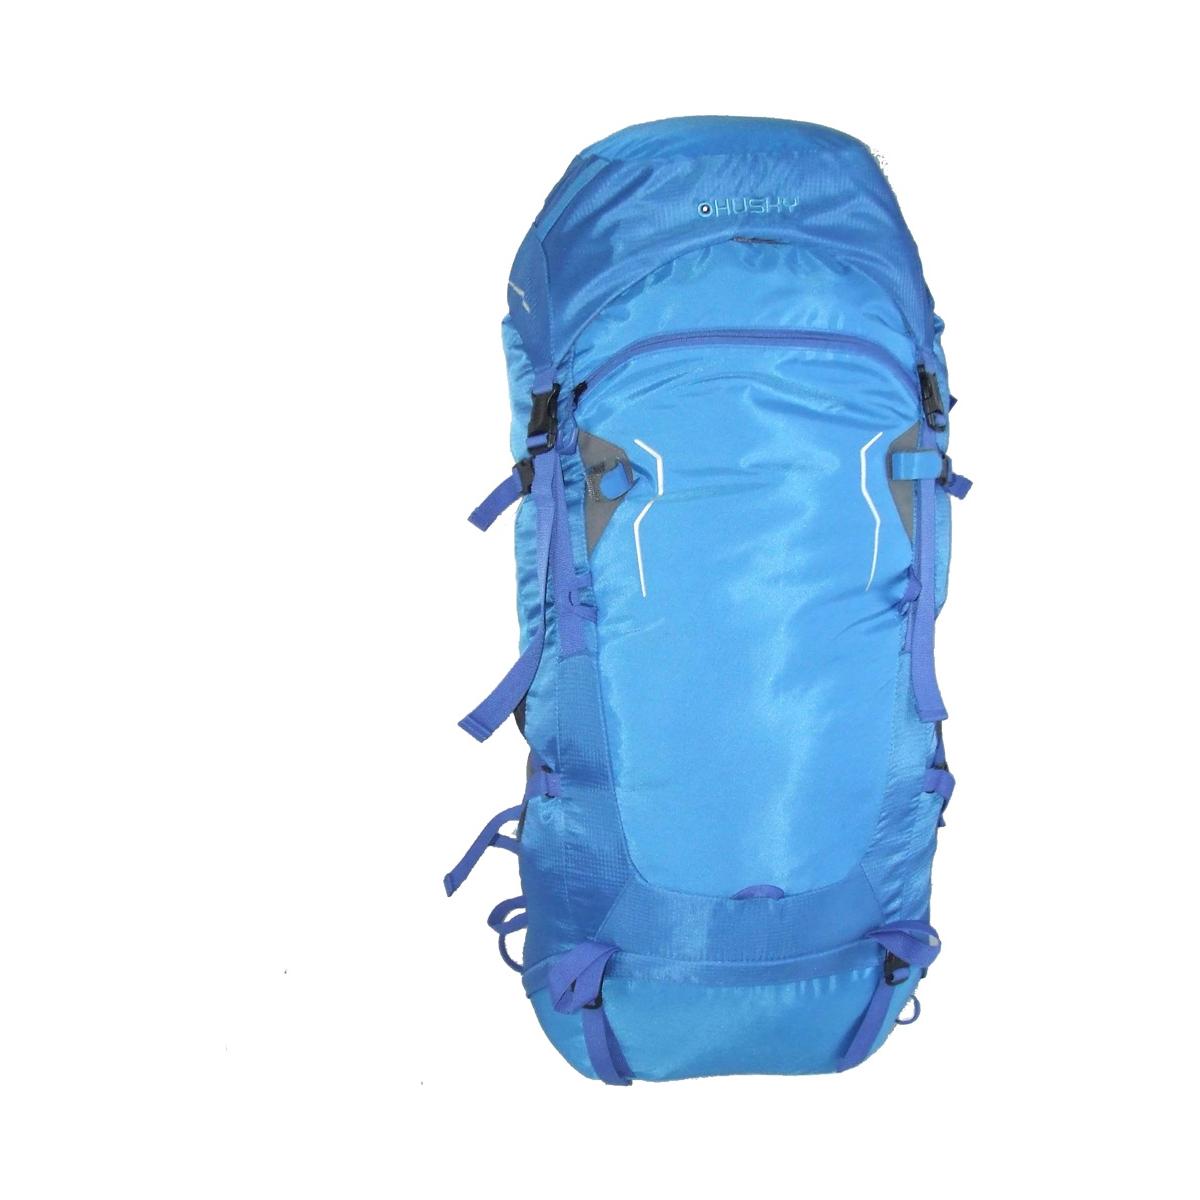 Batoh Expediční – Ranis 70l. Ranis 70l 626e9eddfa